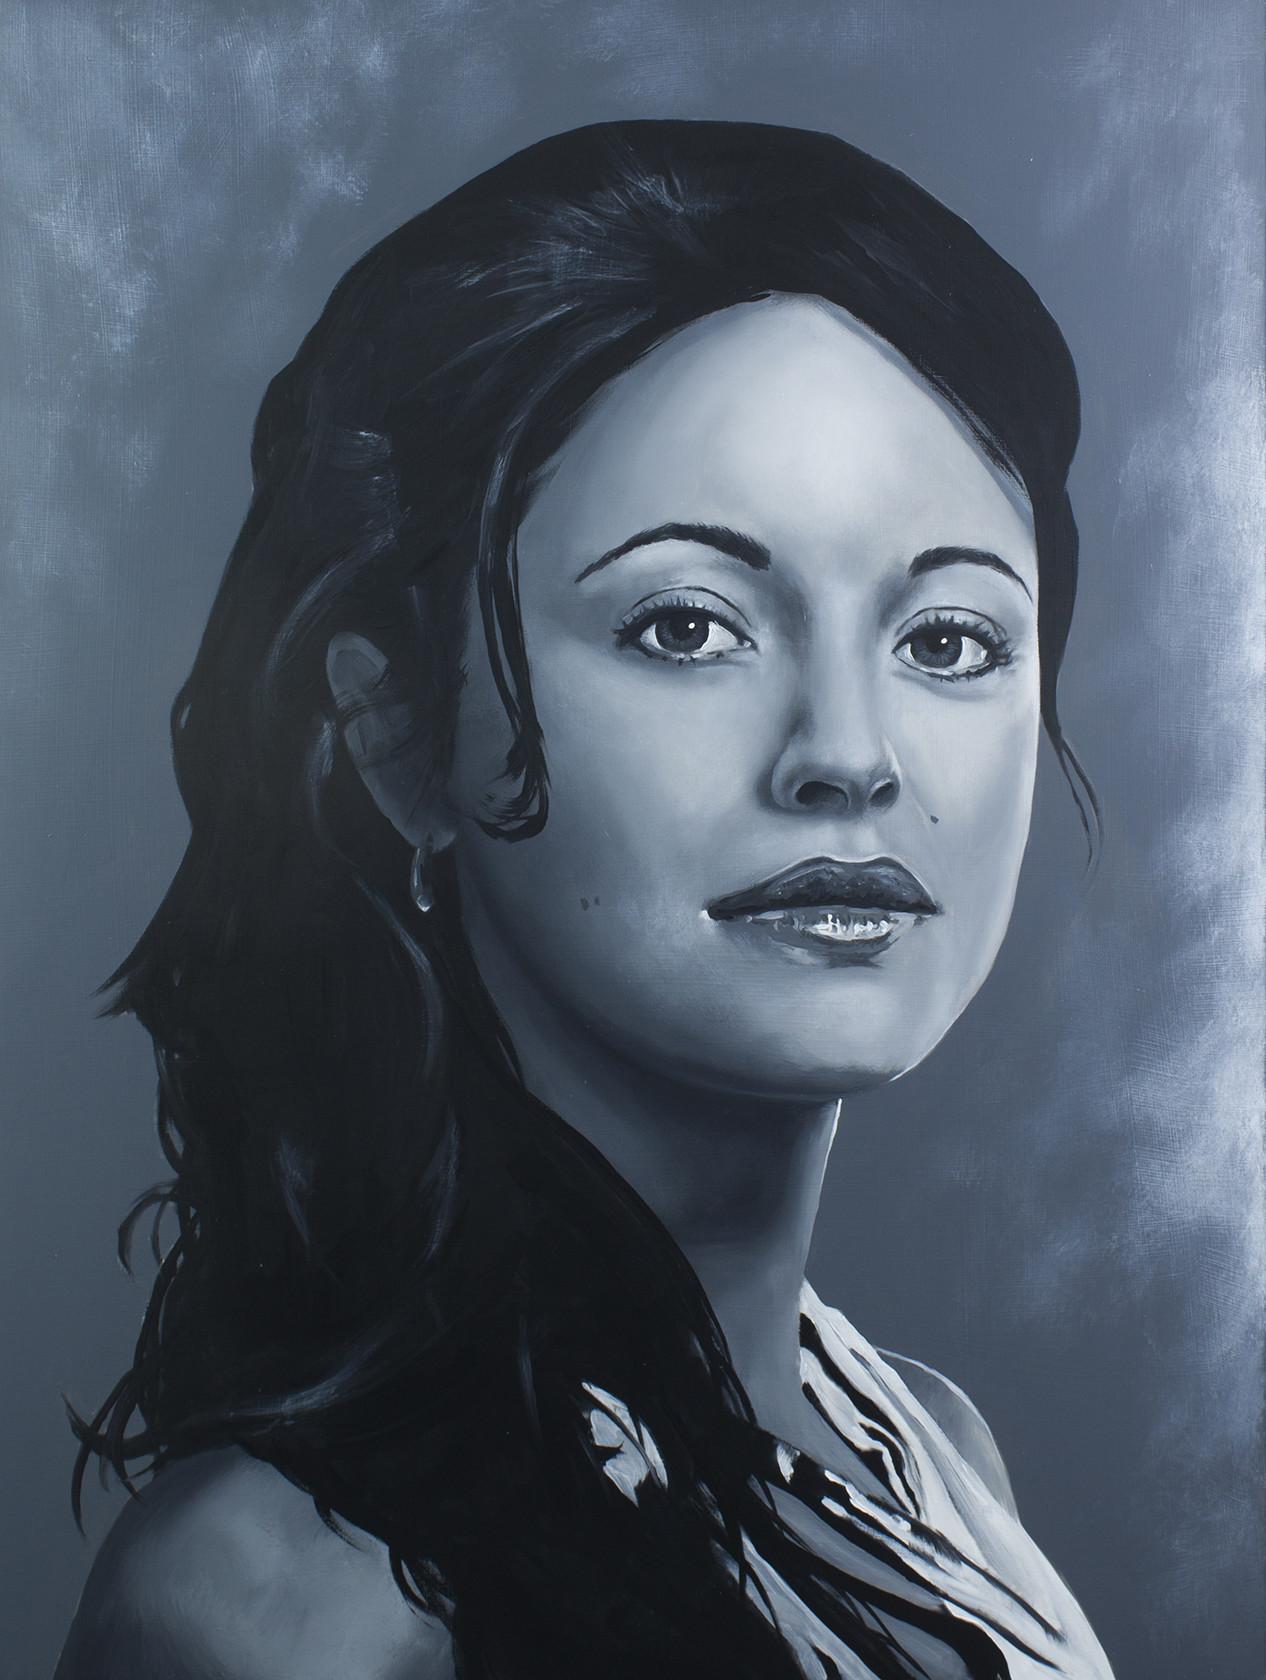 Melitta - Marisa Ramirez Spartacus Series - Acrylic on board. 16x20